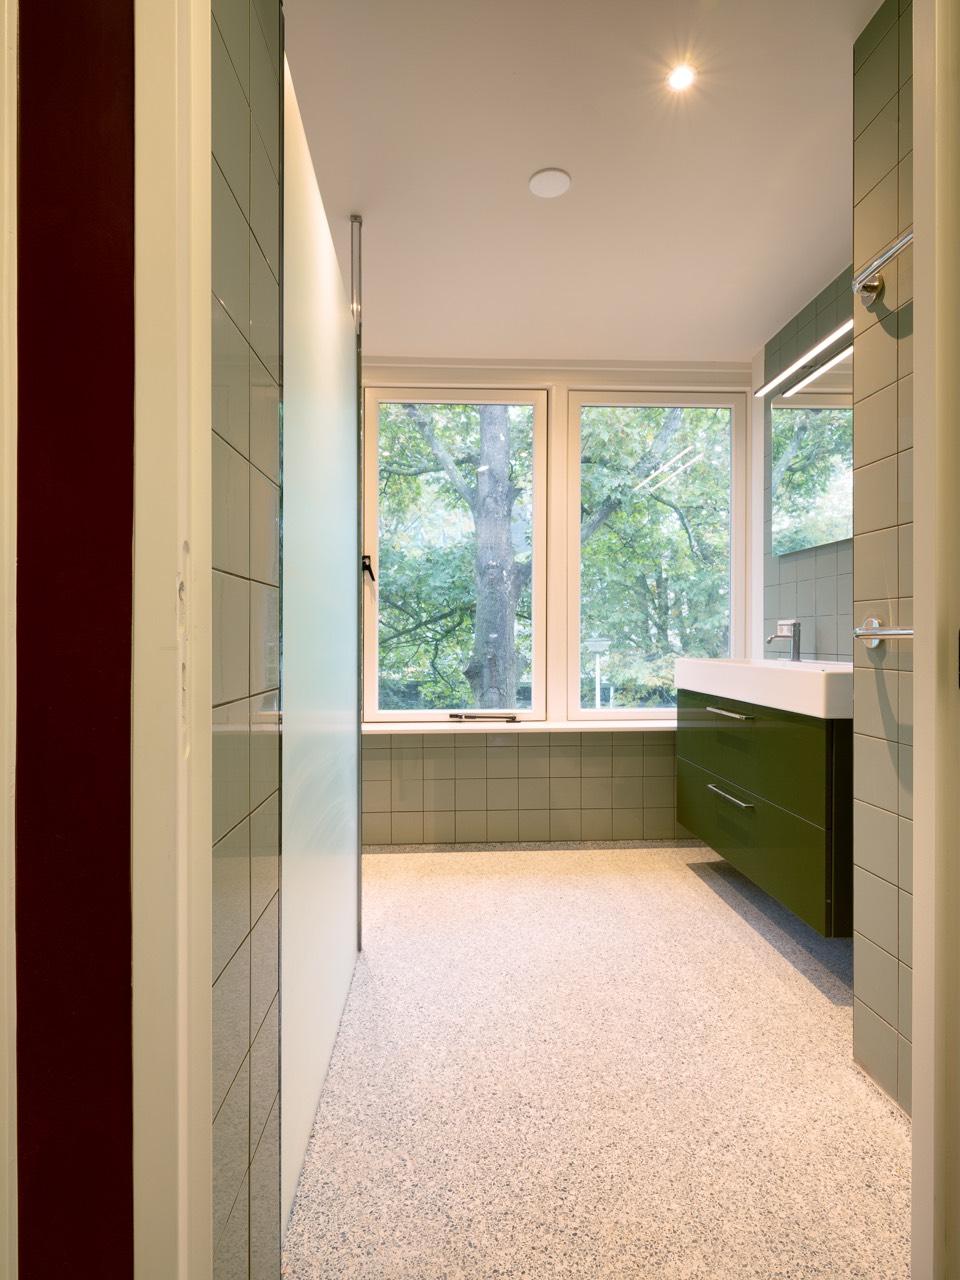 kolenkit-evelijn-ferwerda-interieur-ontwerp-badkamer